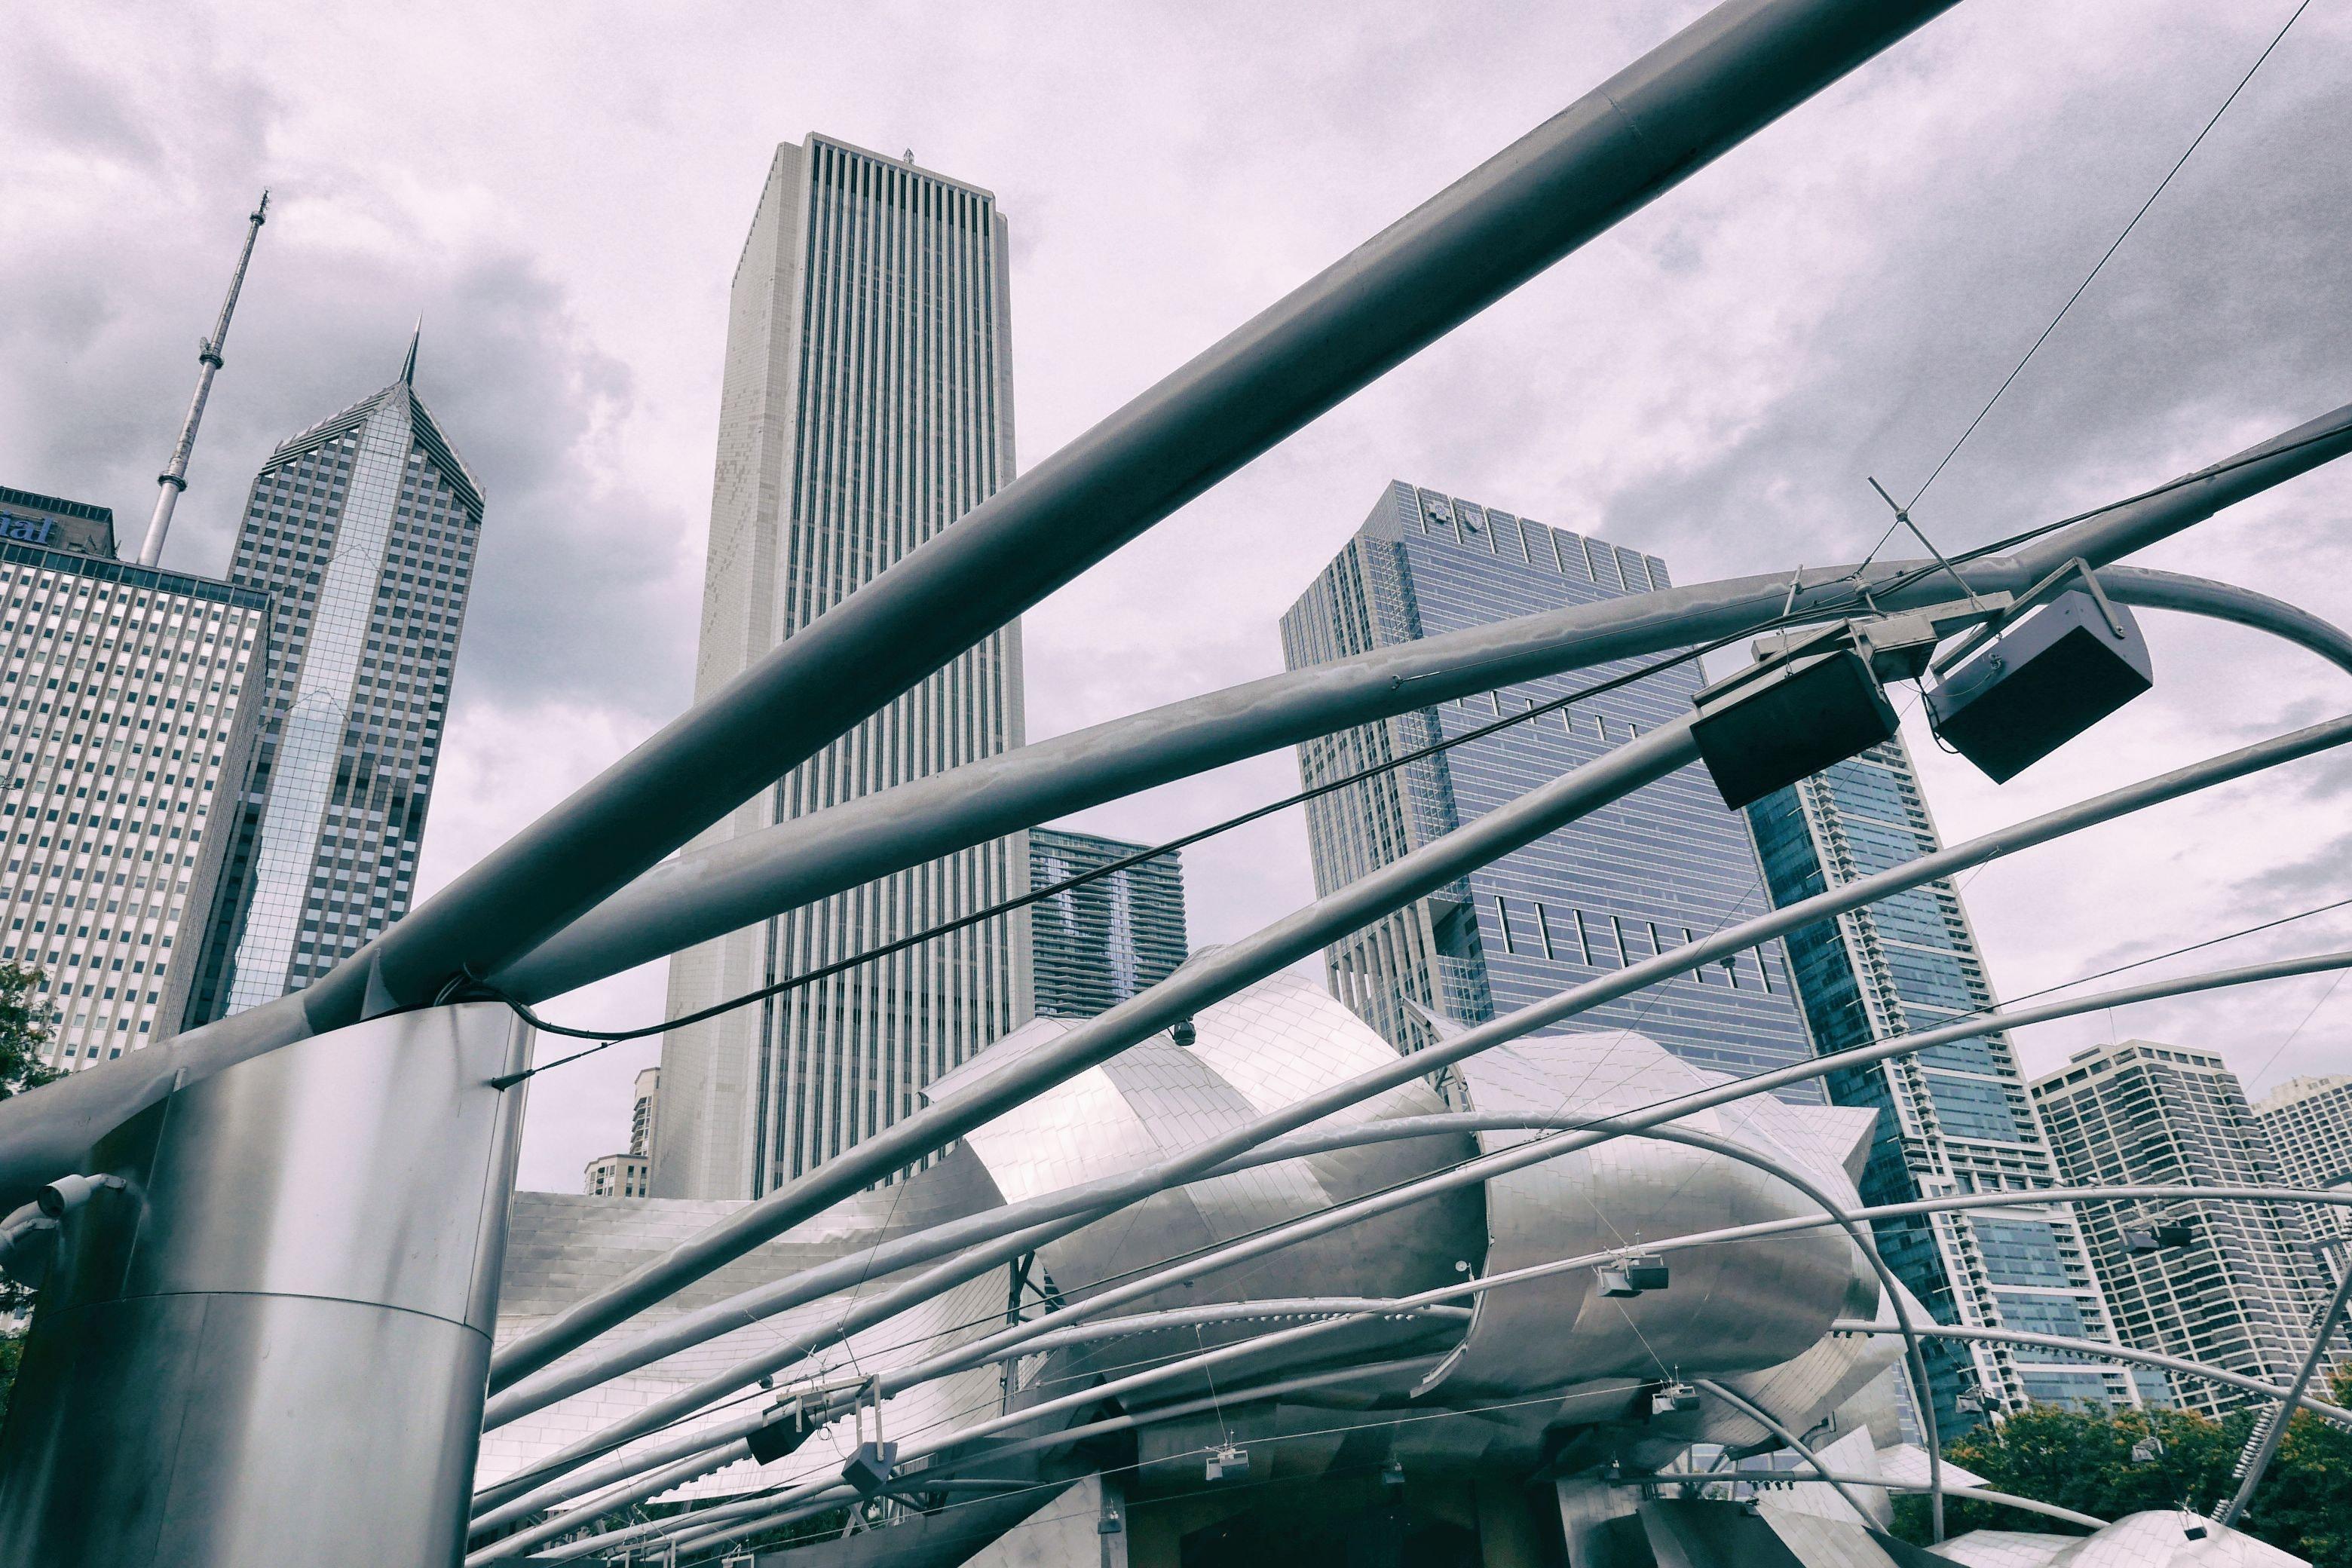 Gary Steel Frame, Architectural design, High, Urban, Tower, HQ Photo